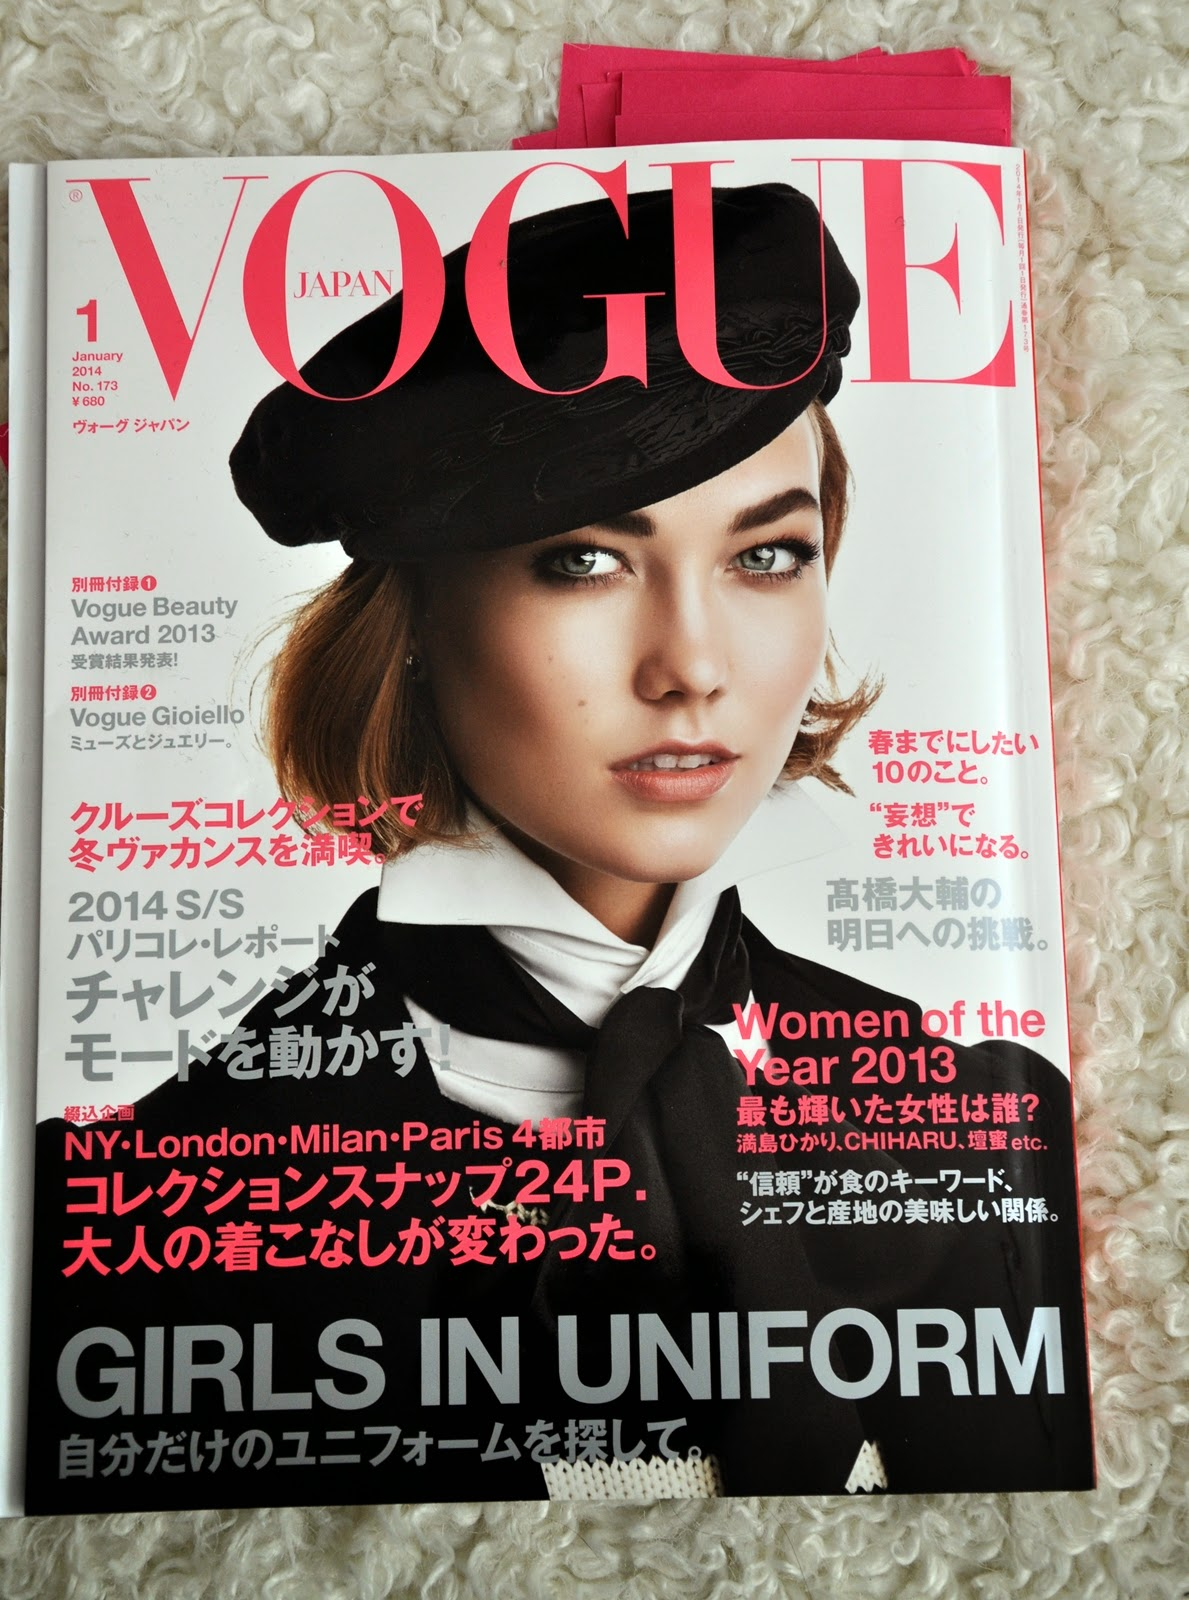 Japan Vogue